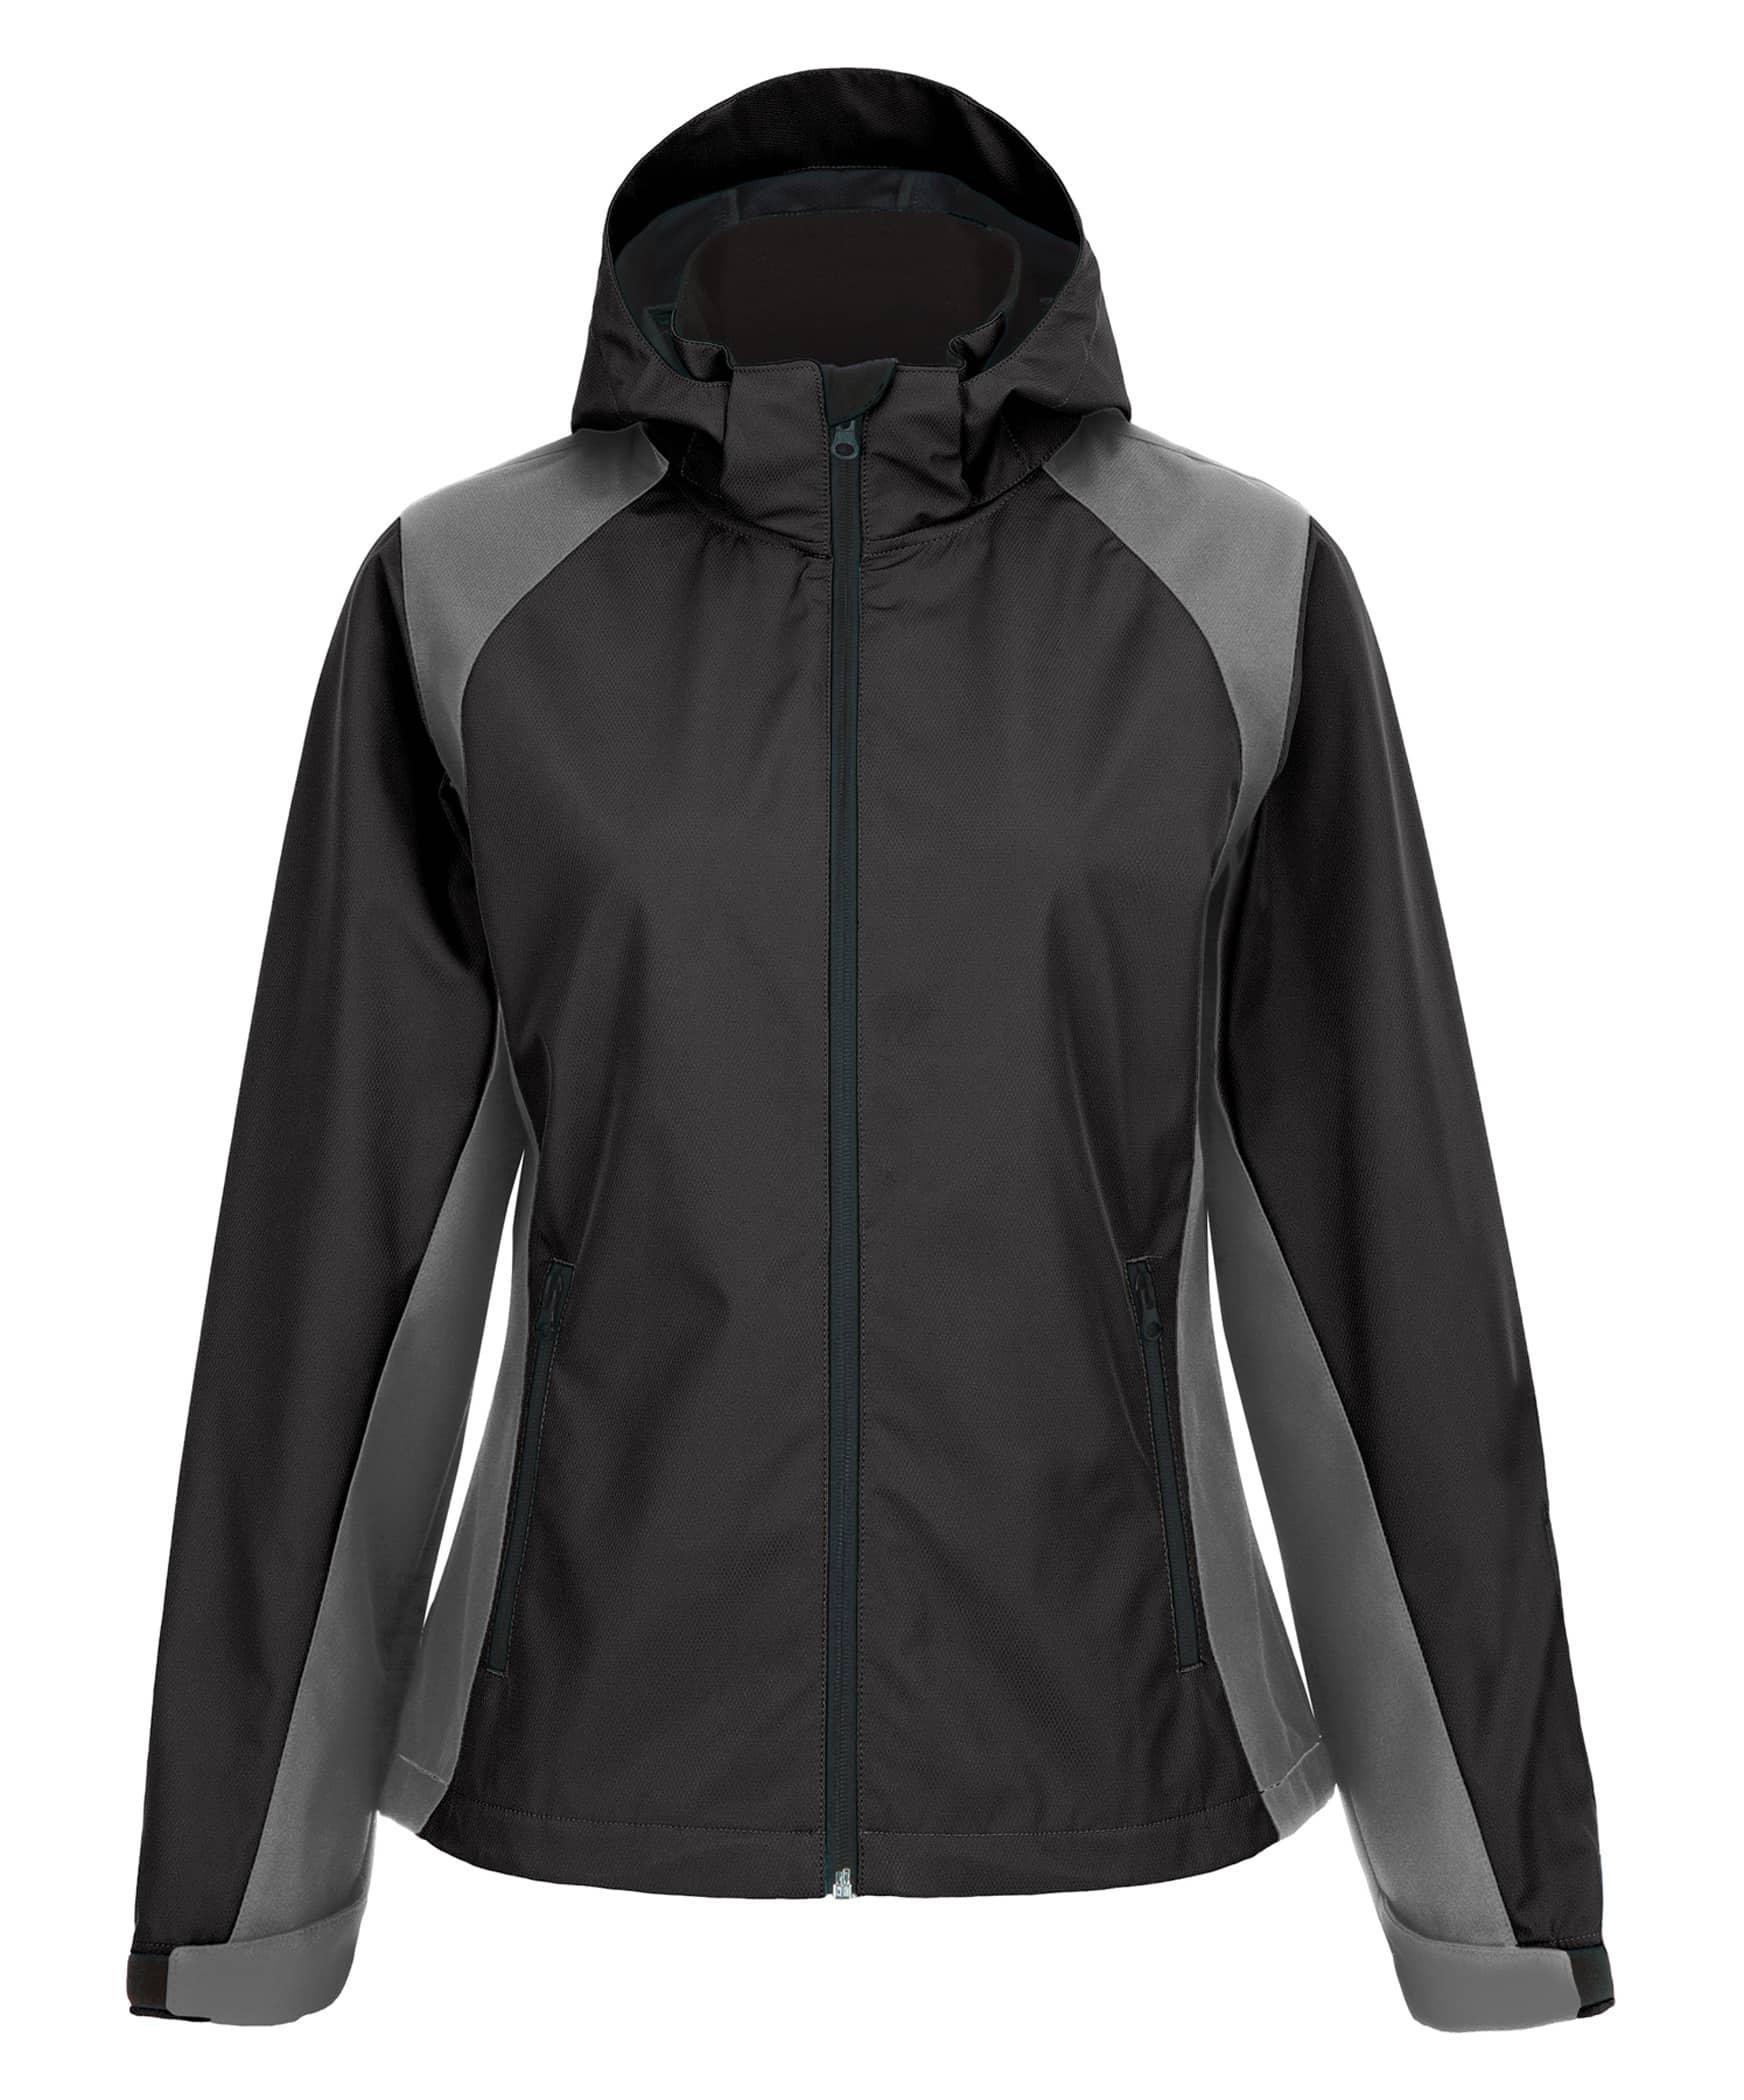 dac034e62 Win this Fila Golf Jacket in Men or Women s (pictured  Women s Rockingham  lightweight jacket